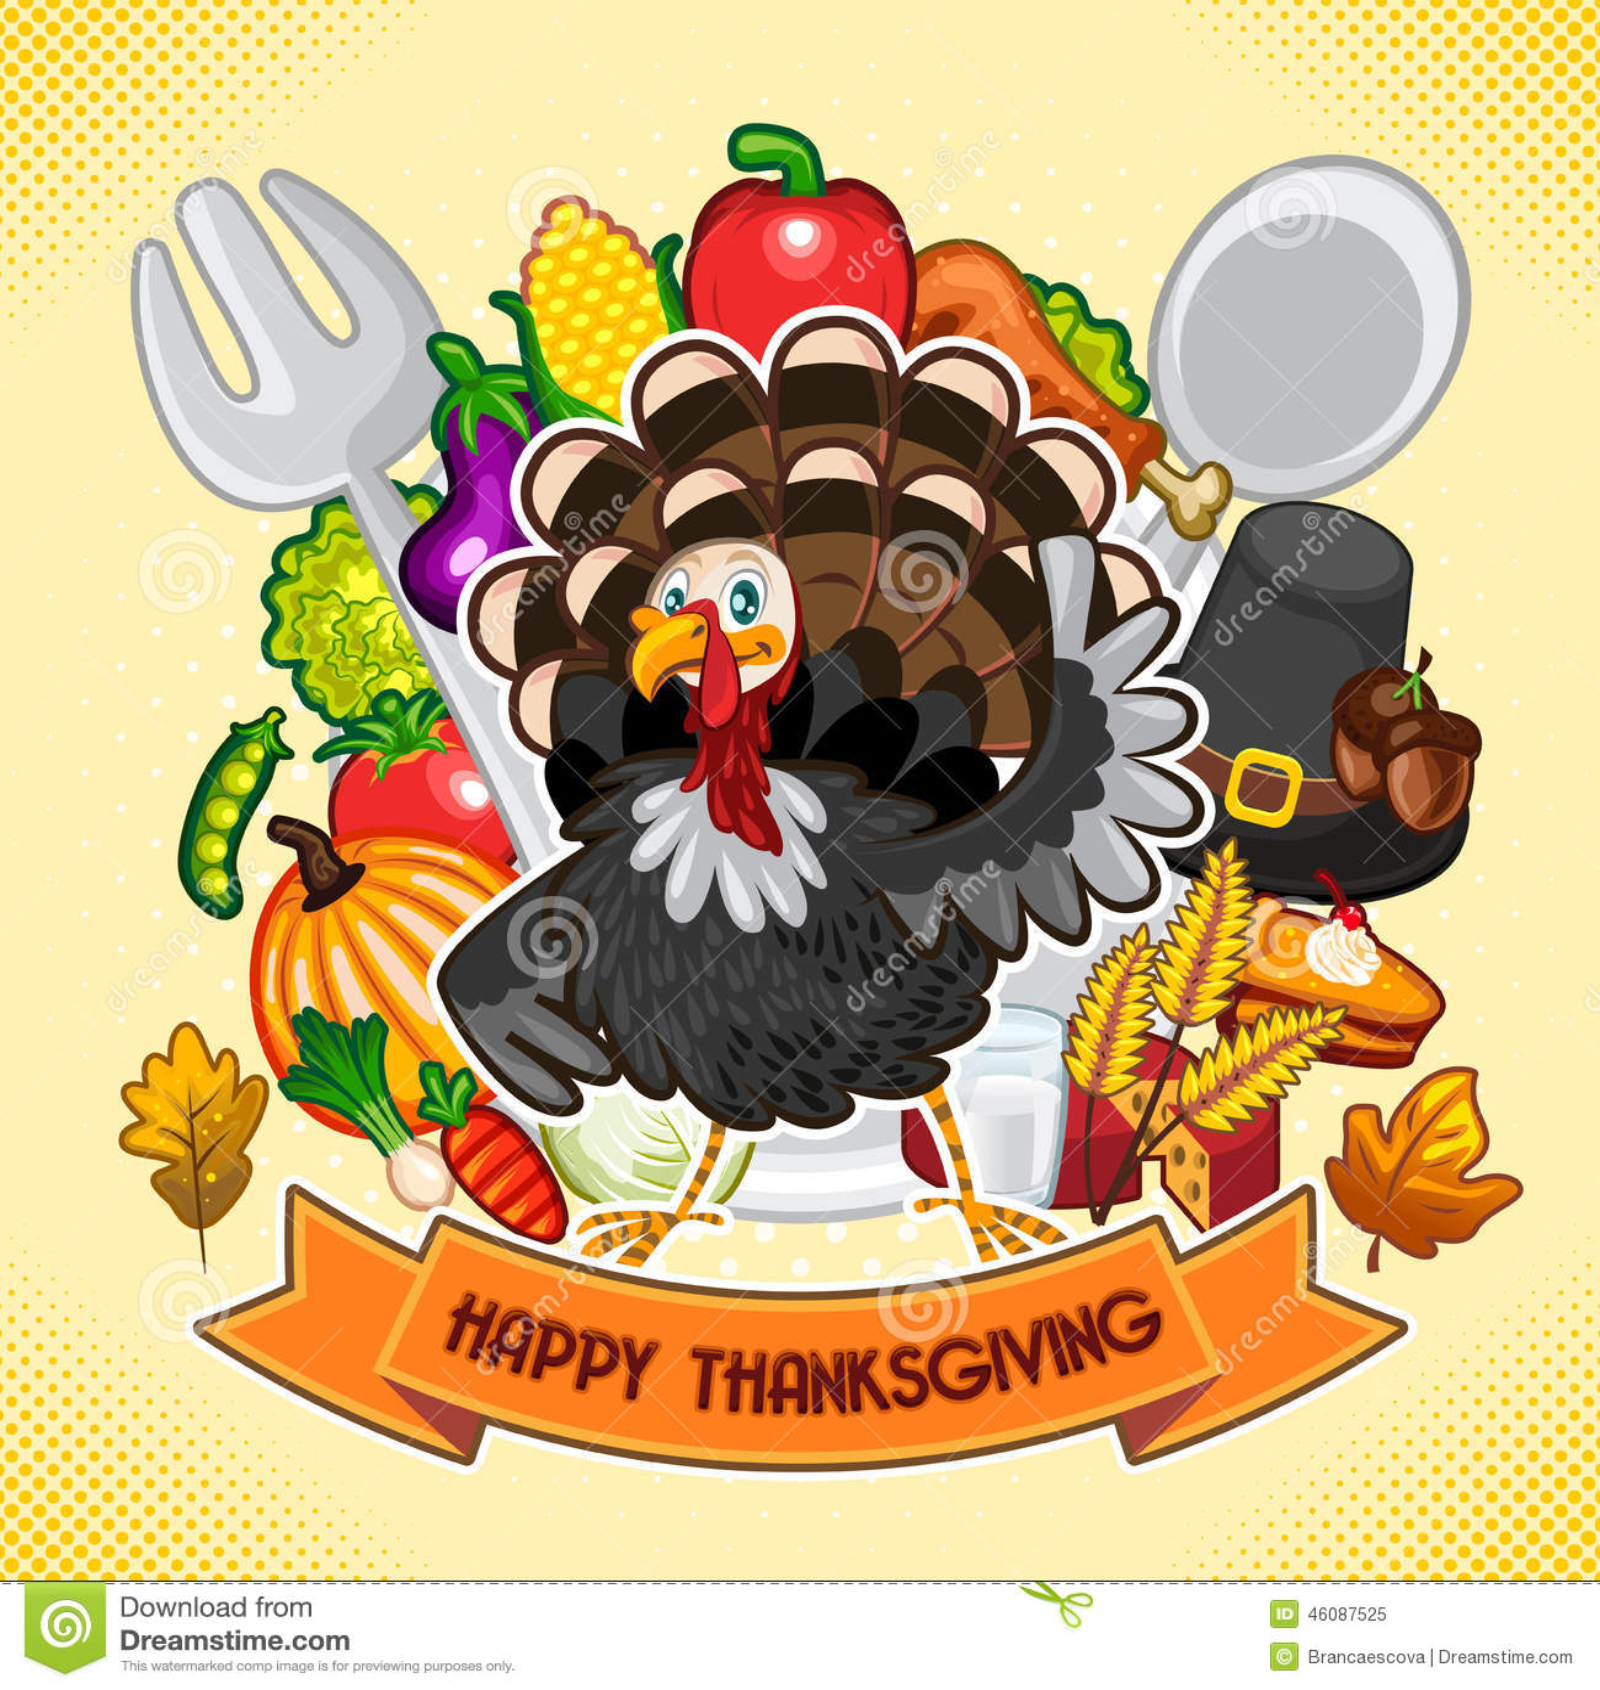 Happy Thanksgiving TurkeyHappy Thanksgiving Turkey